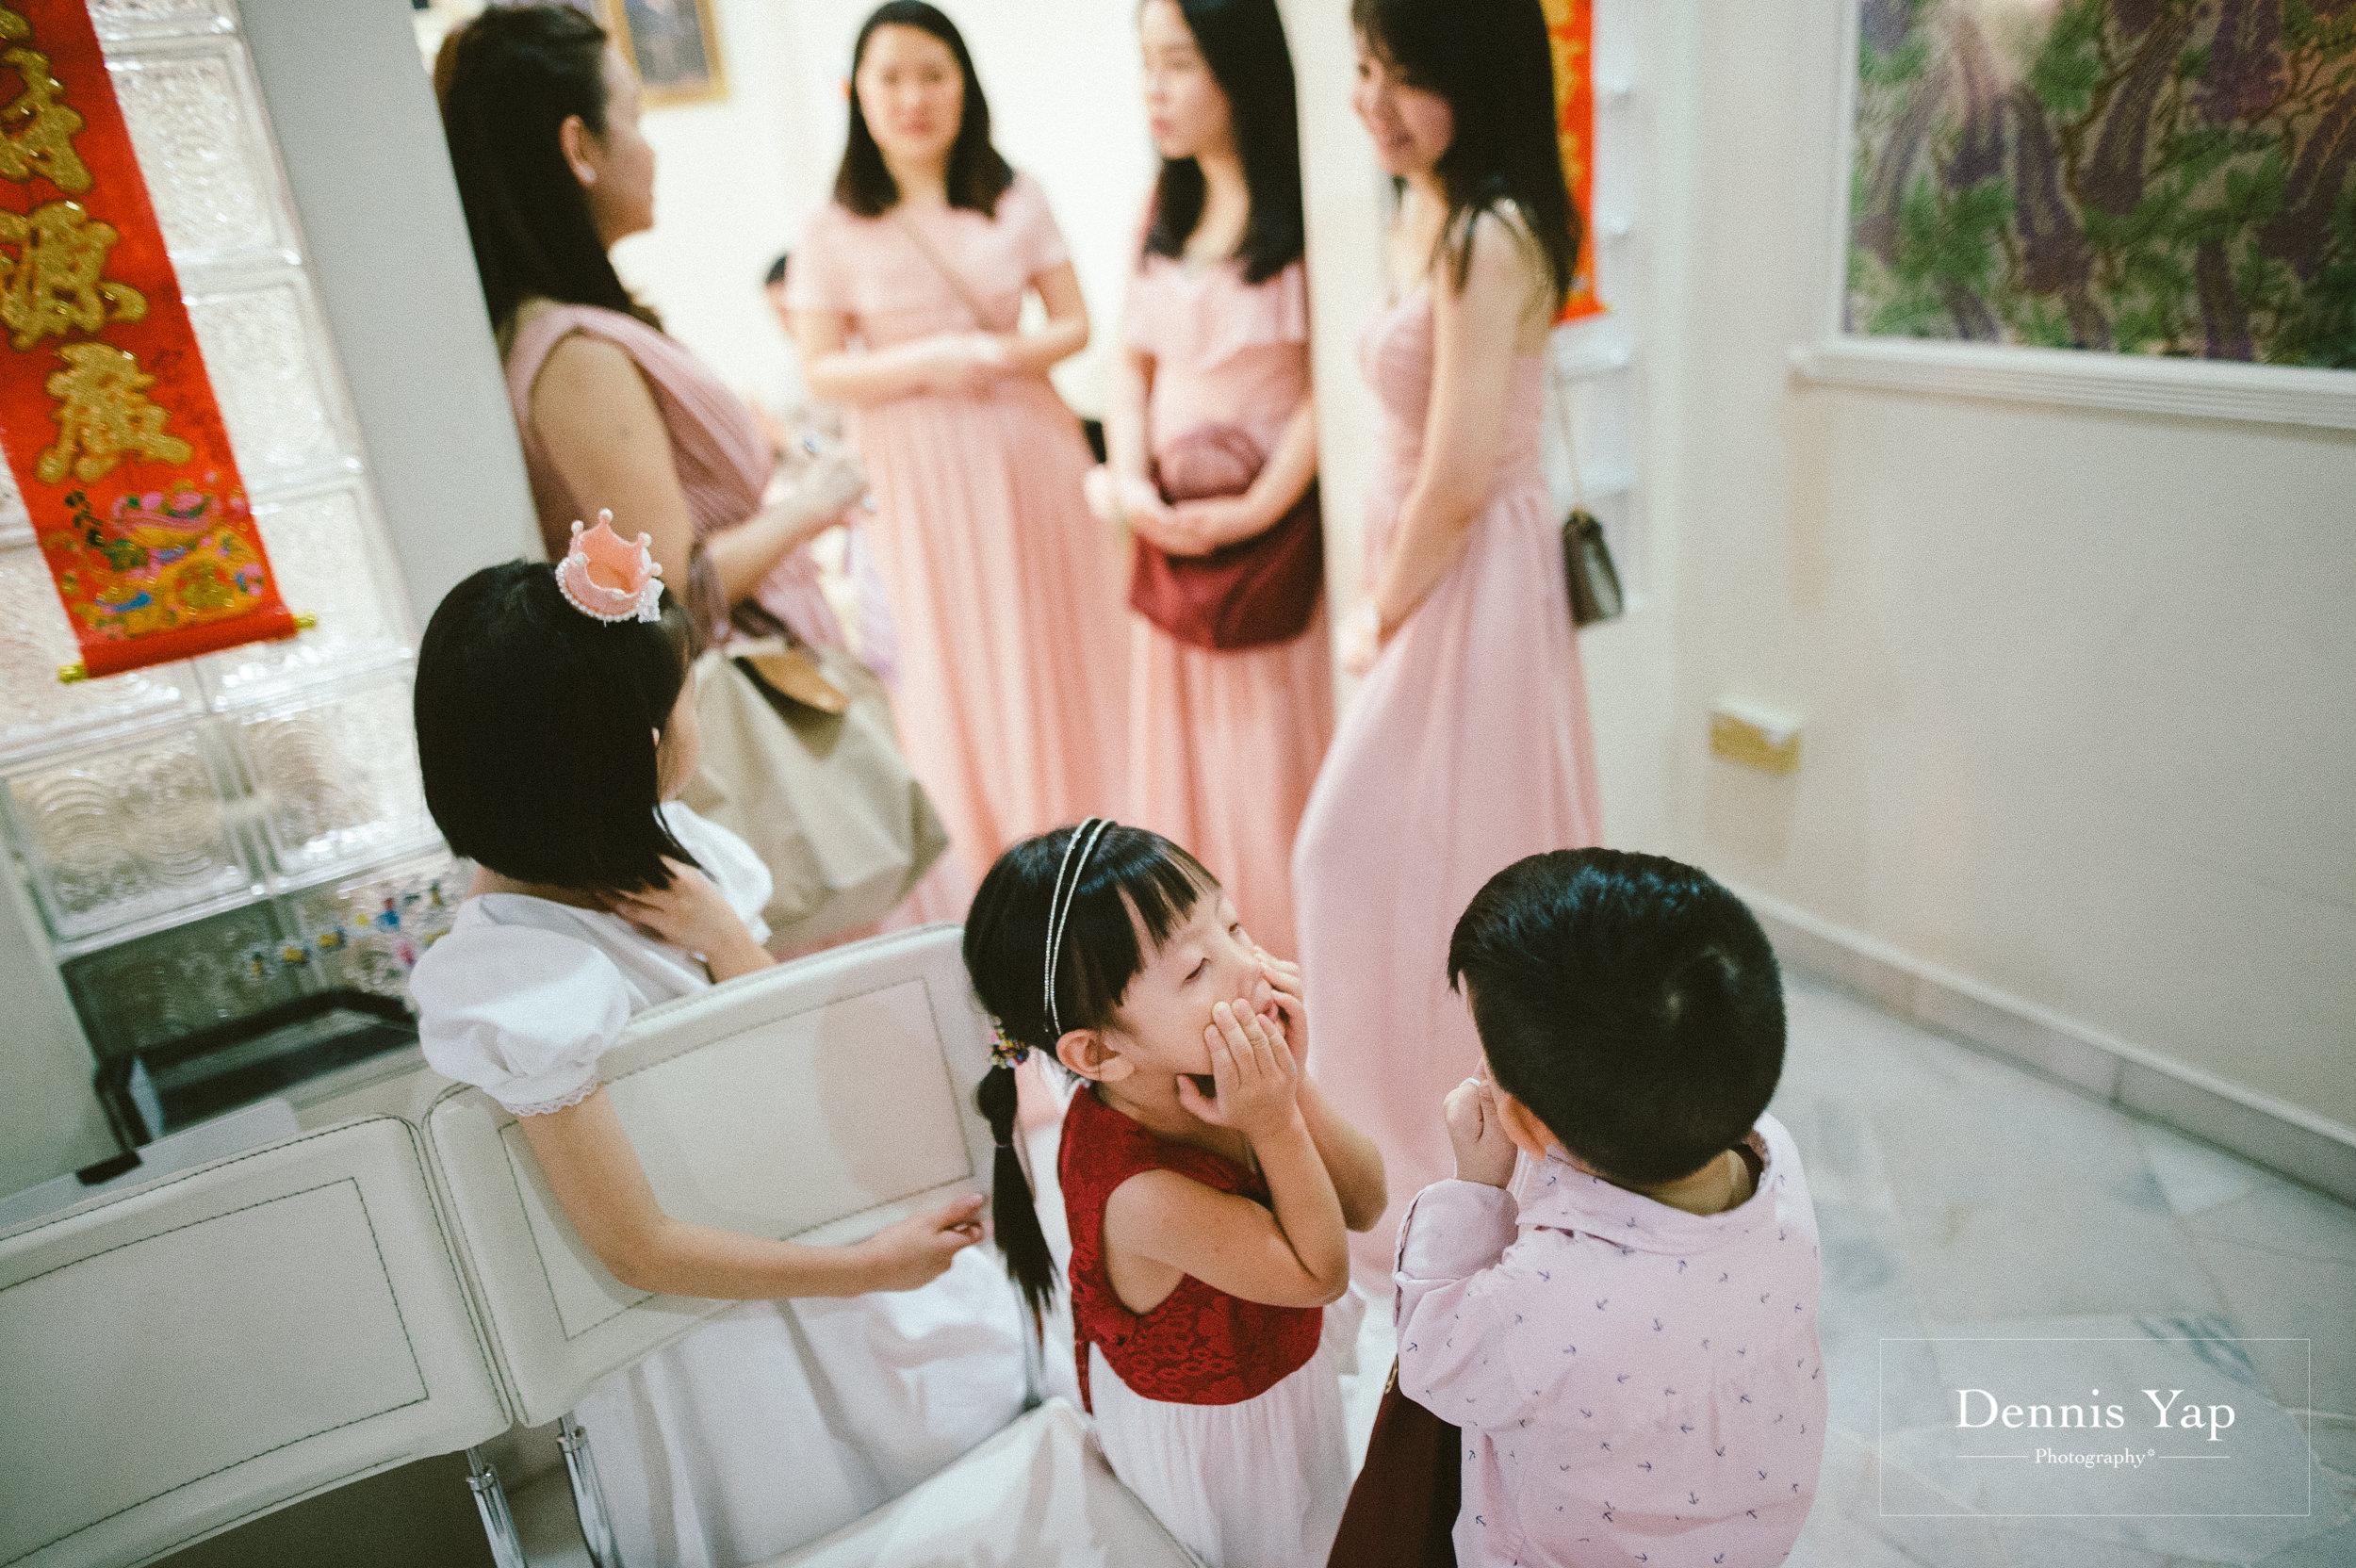 chuan wai angela wedding day bukit jelutong selangor malaysia dennis yap photography-5.jpg